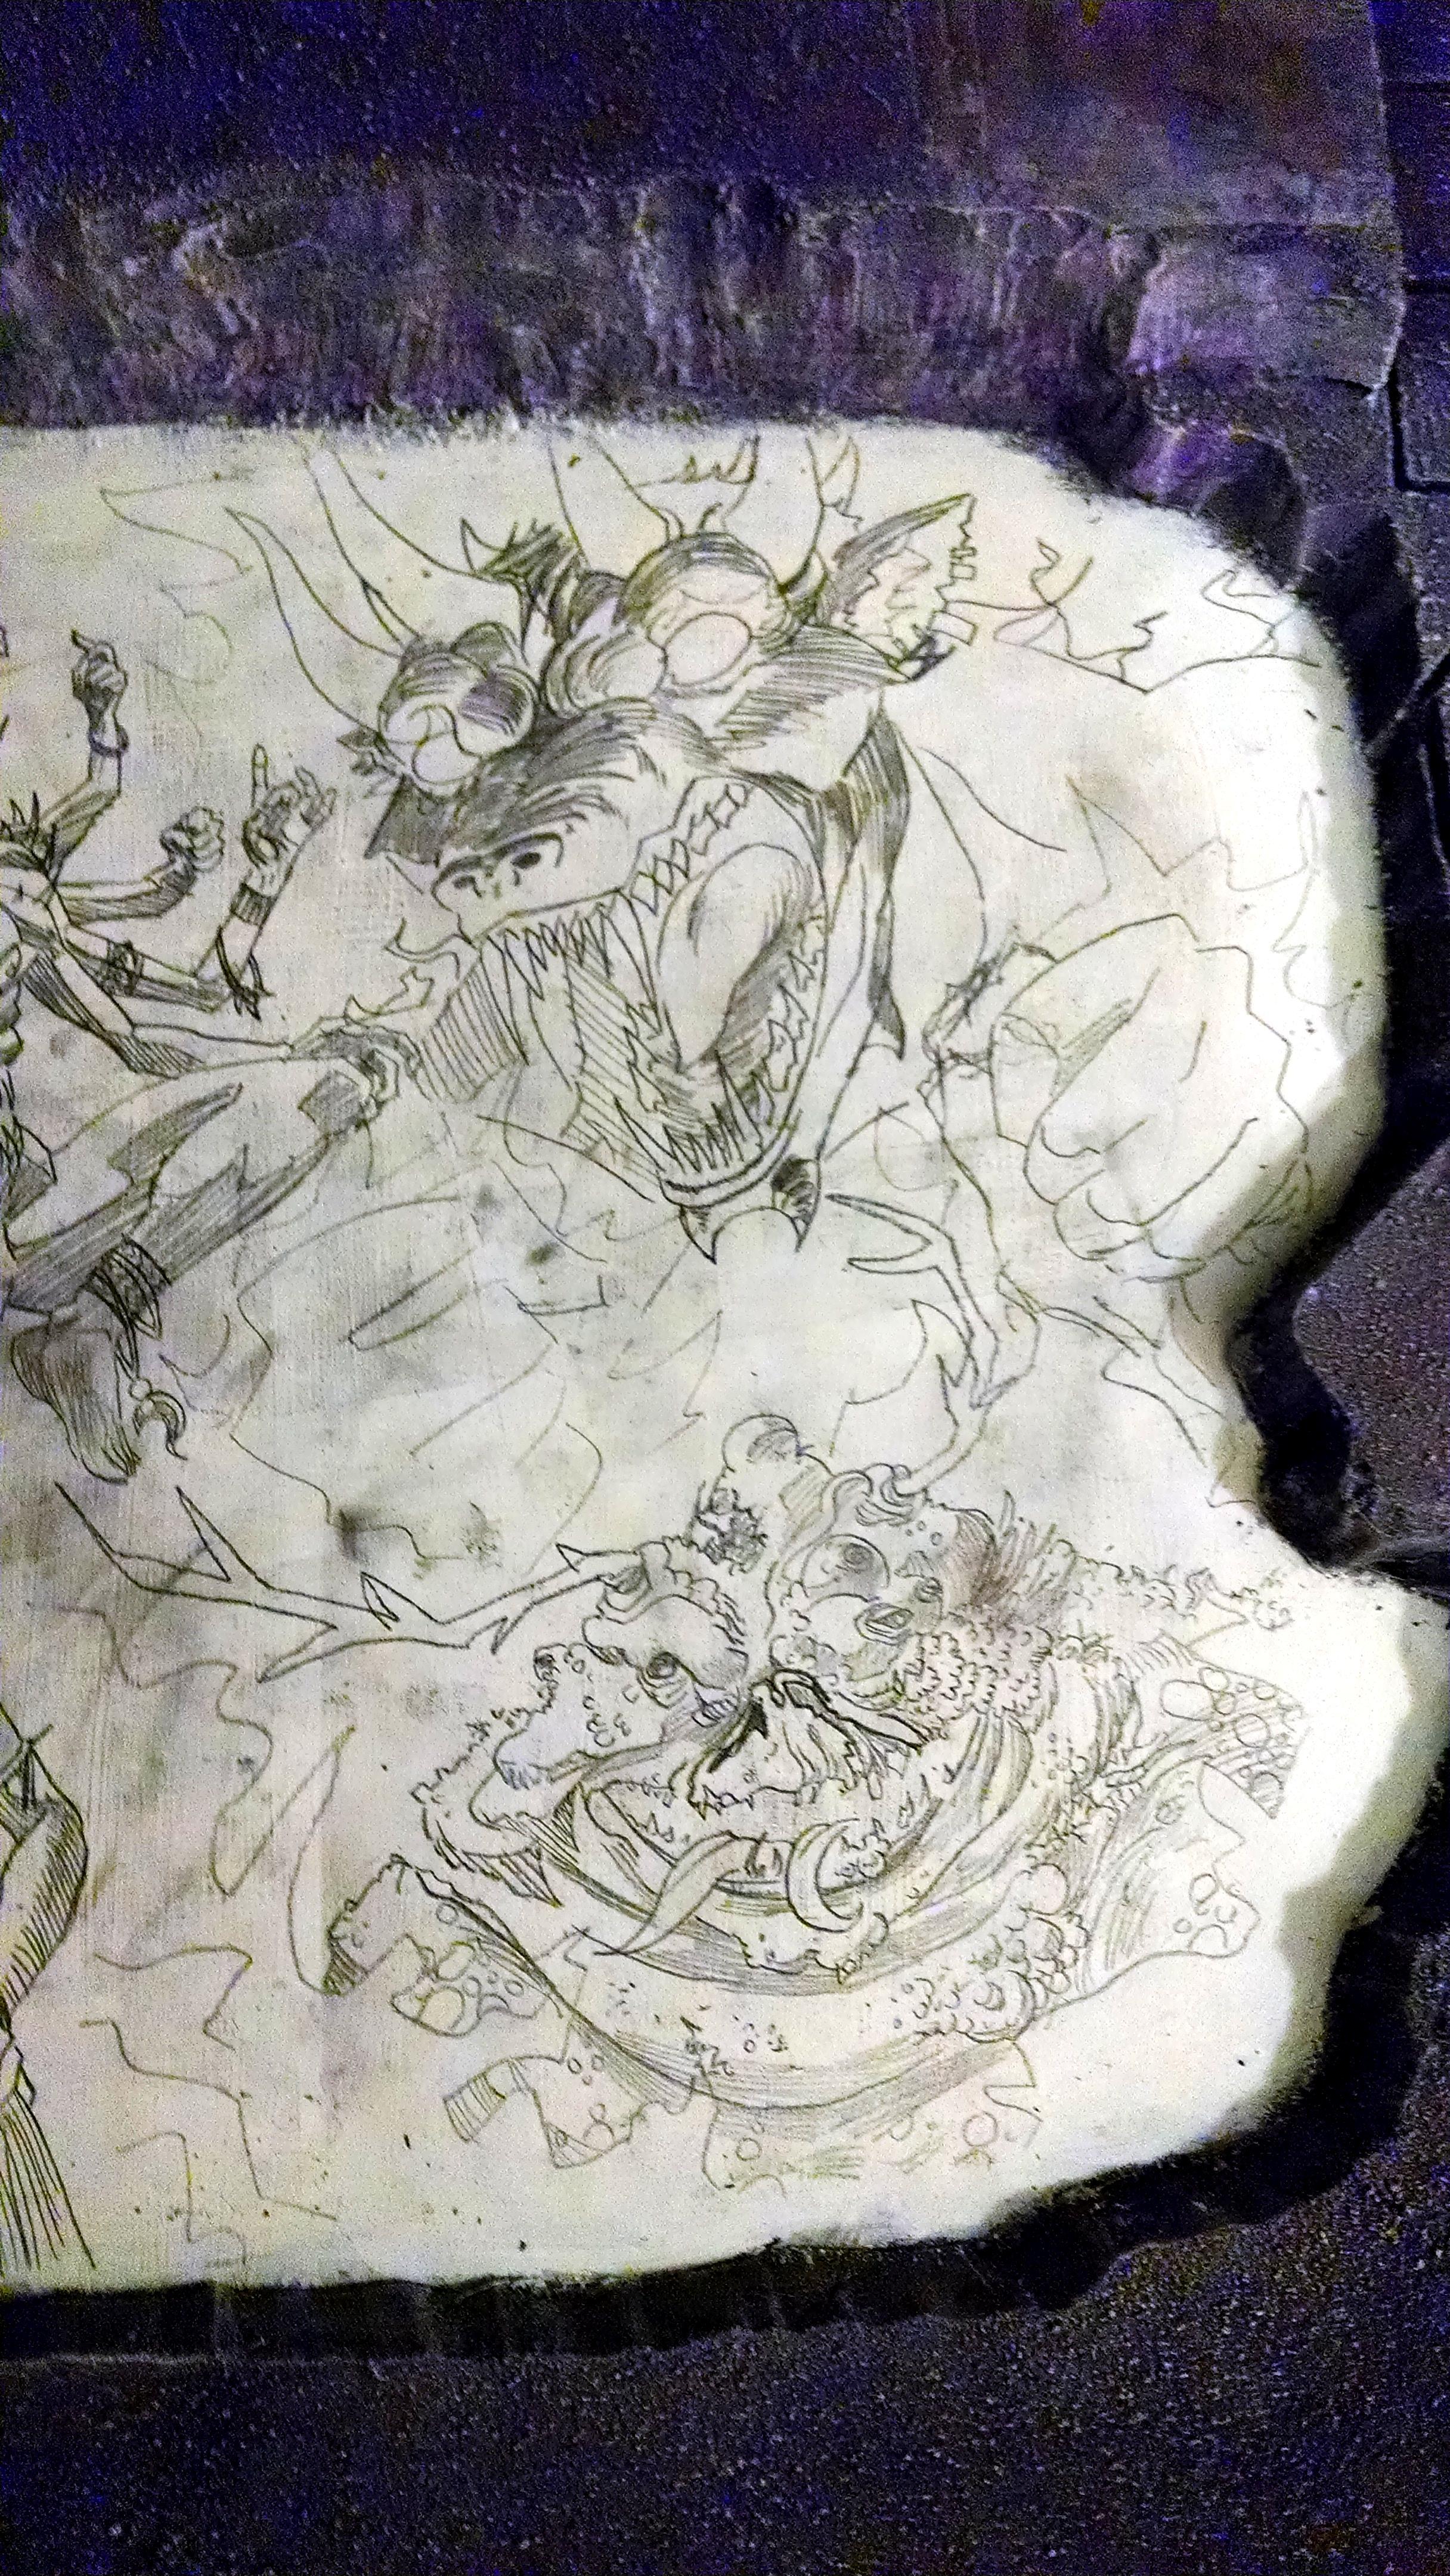 Chaos, Chaos Warrior, Daemons, Display Board, Freehand, Illustration, Khorne, Nurgle, Slaanesh, Tzeentch